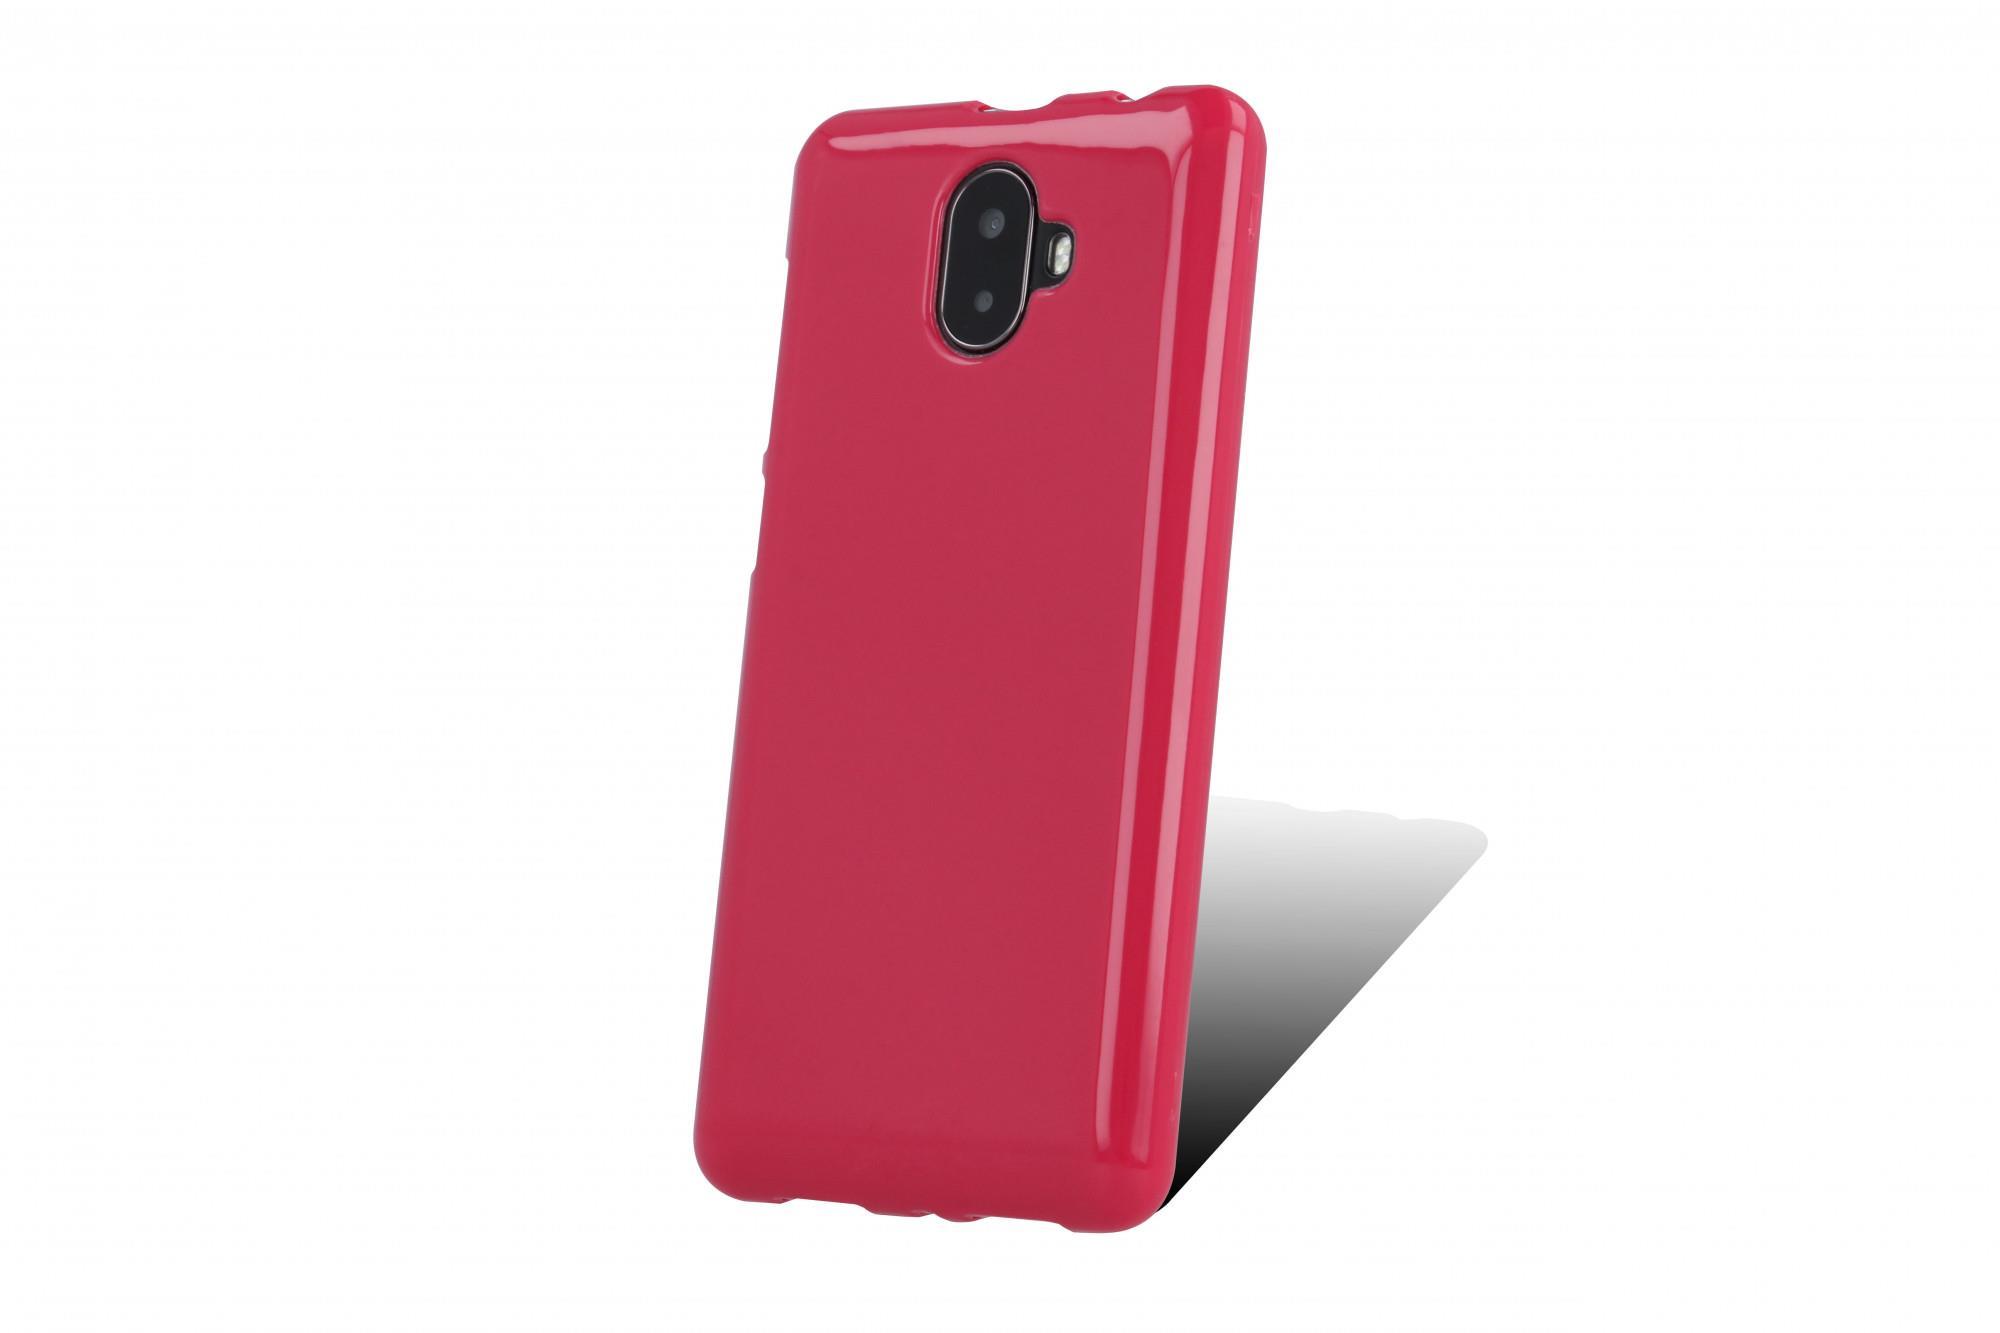 SILIKONOVÉ (TPU) POUZDRO RŮŽOVÉ PRO myPhone POCKET 18x9